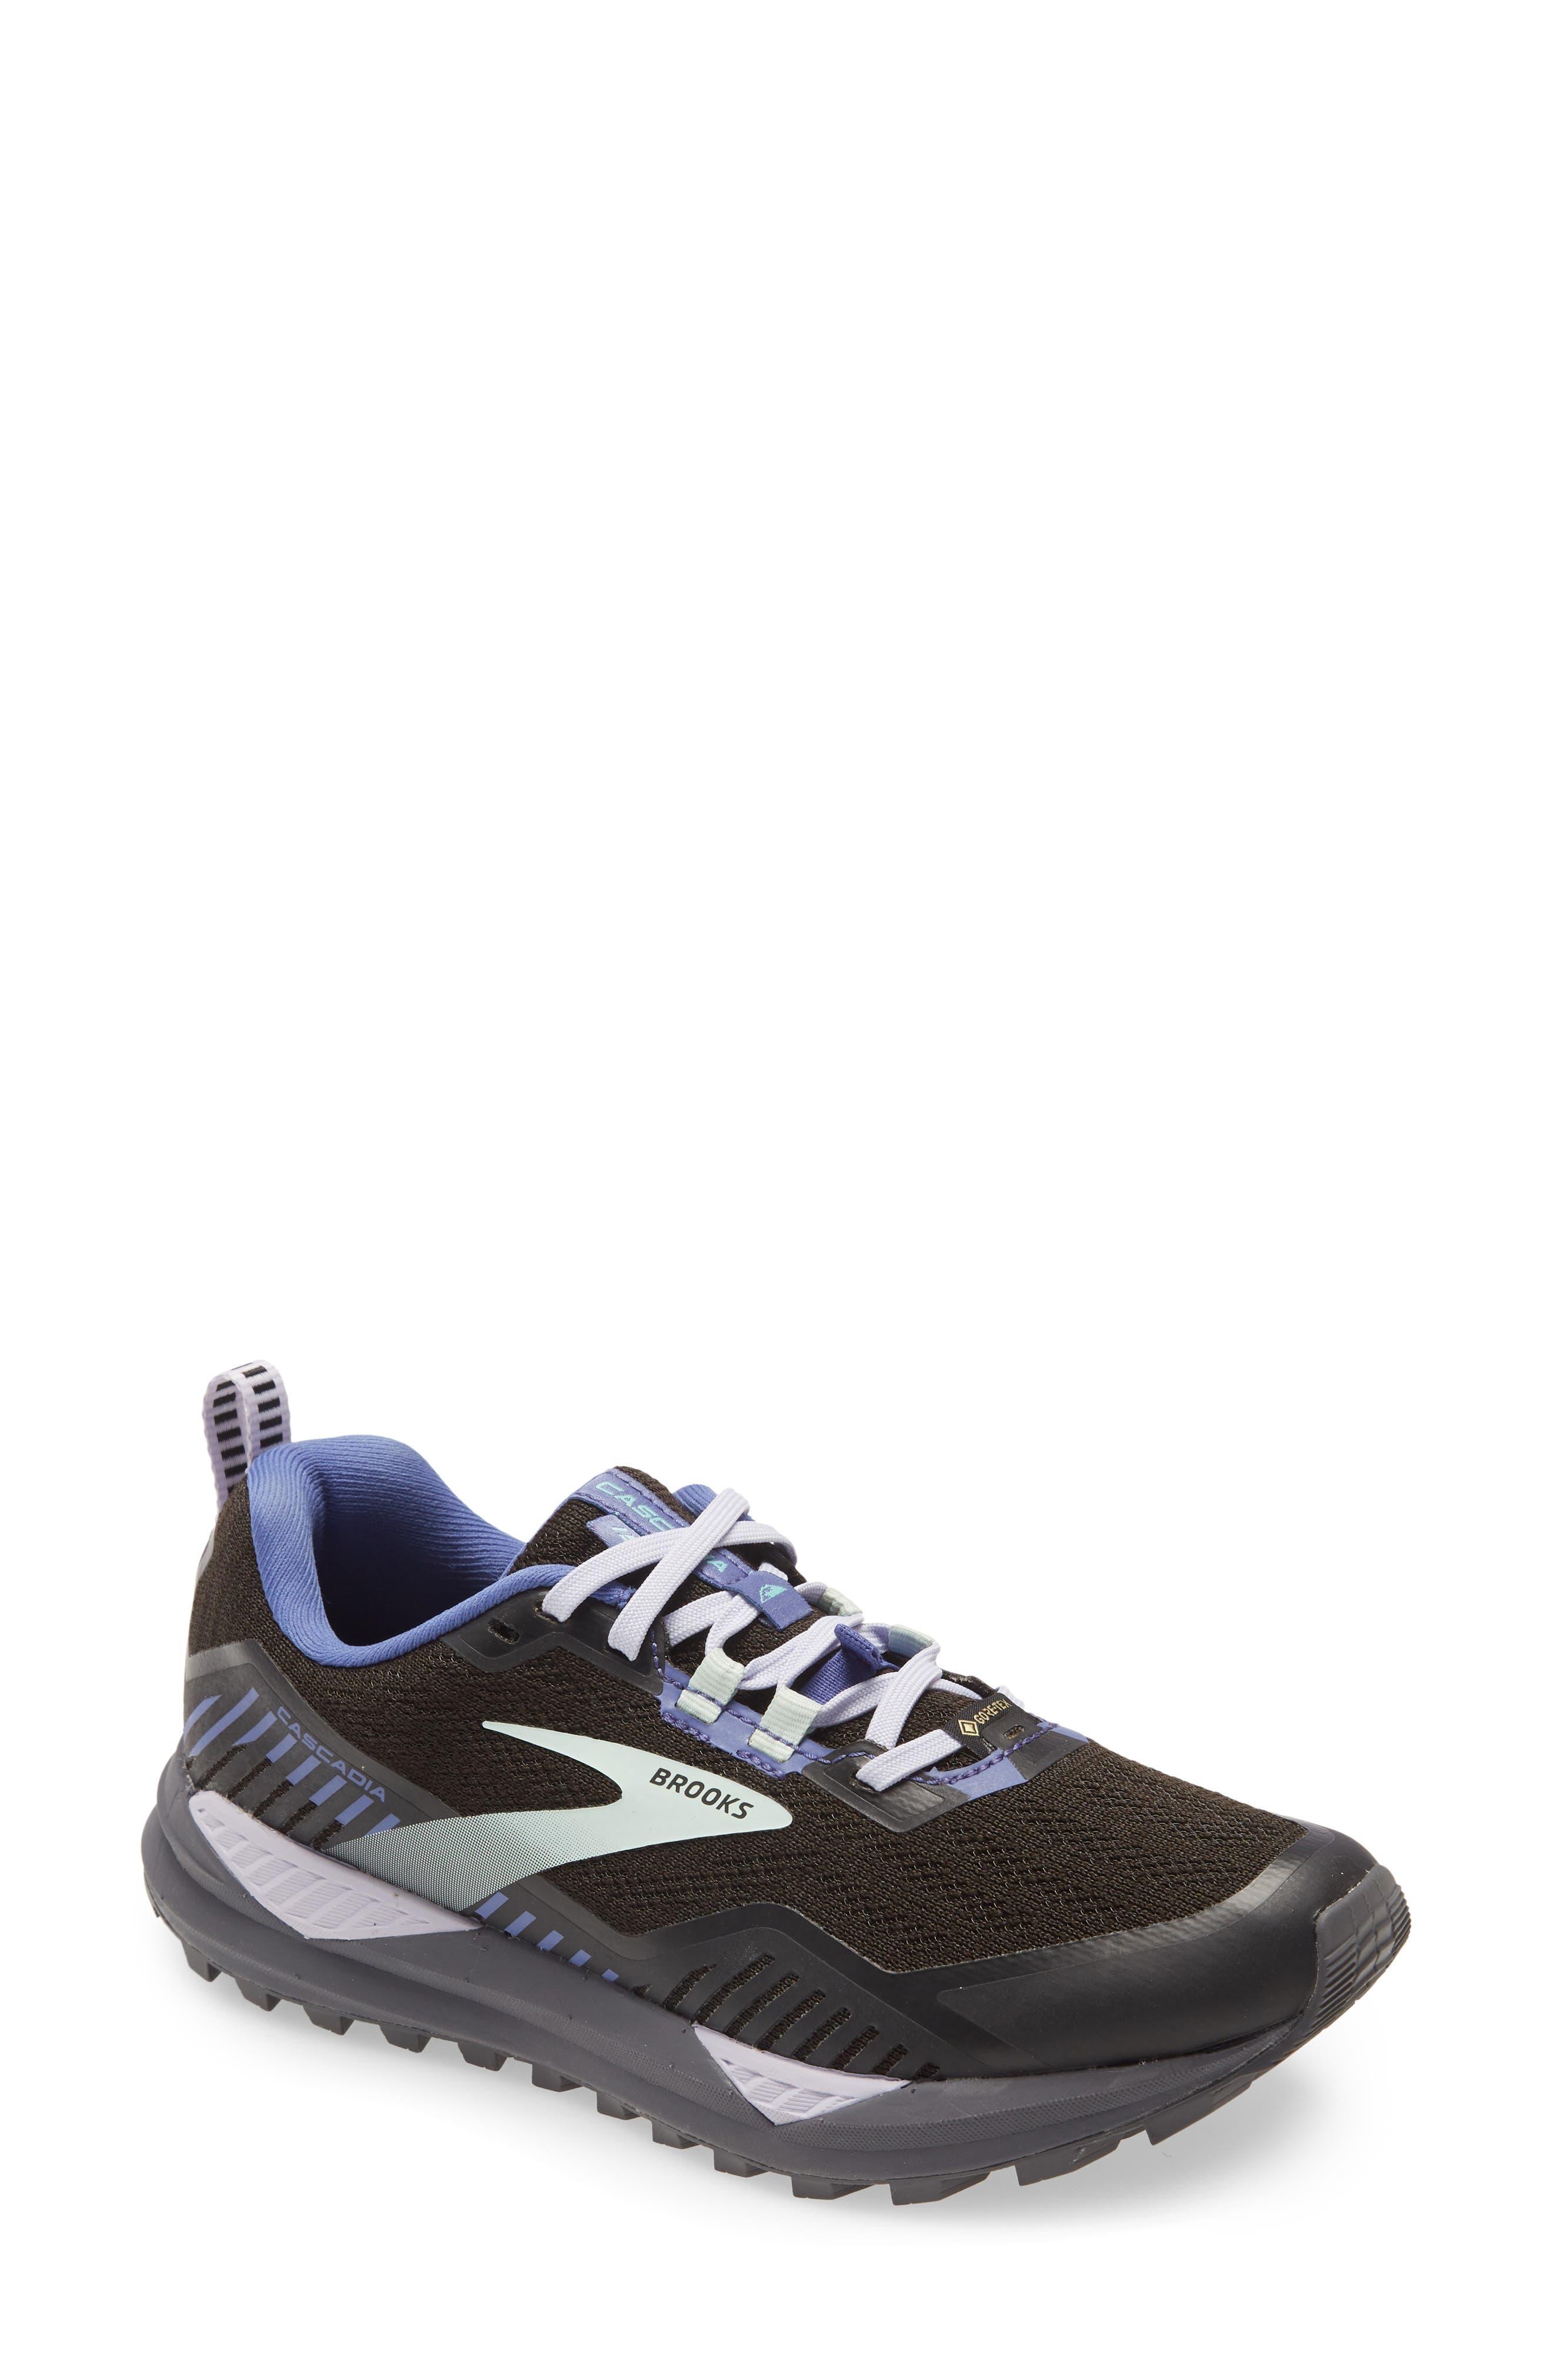 Cascadia 15 Gtx Gore-Tex Waterproof Trail Running Shoe